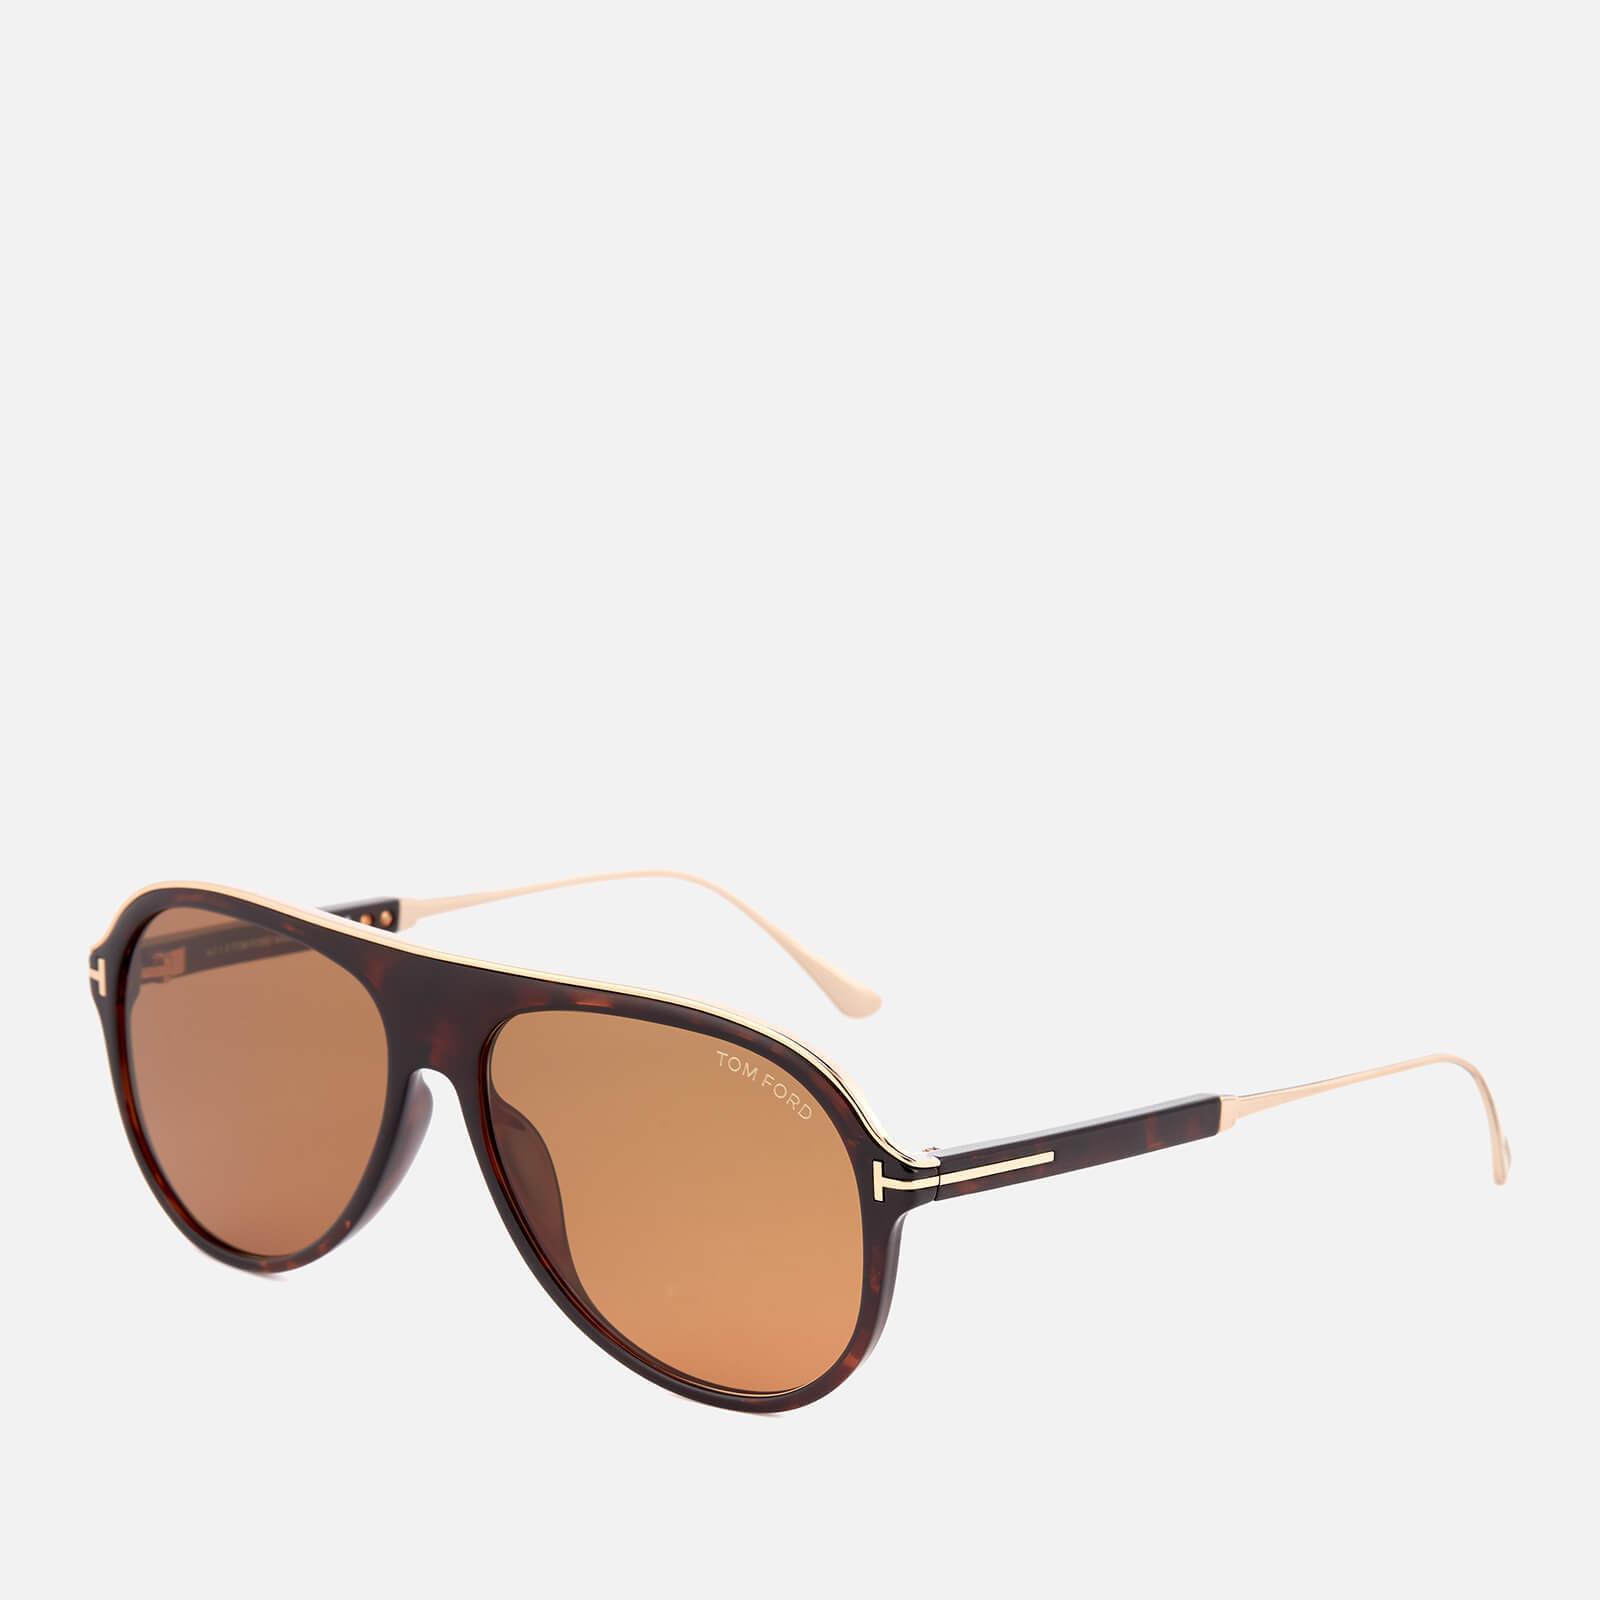 c1947f1e0ab Tom Ford - Brown Nicholai Aviator Sunglasses for Men - Lyst. View fullscreen